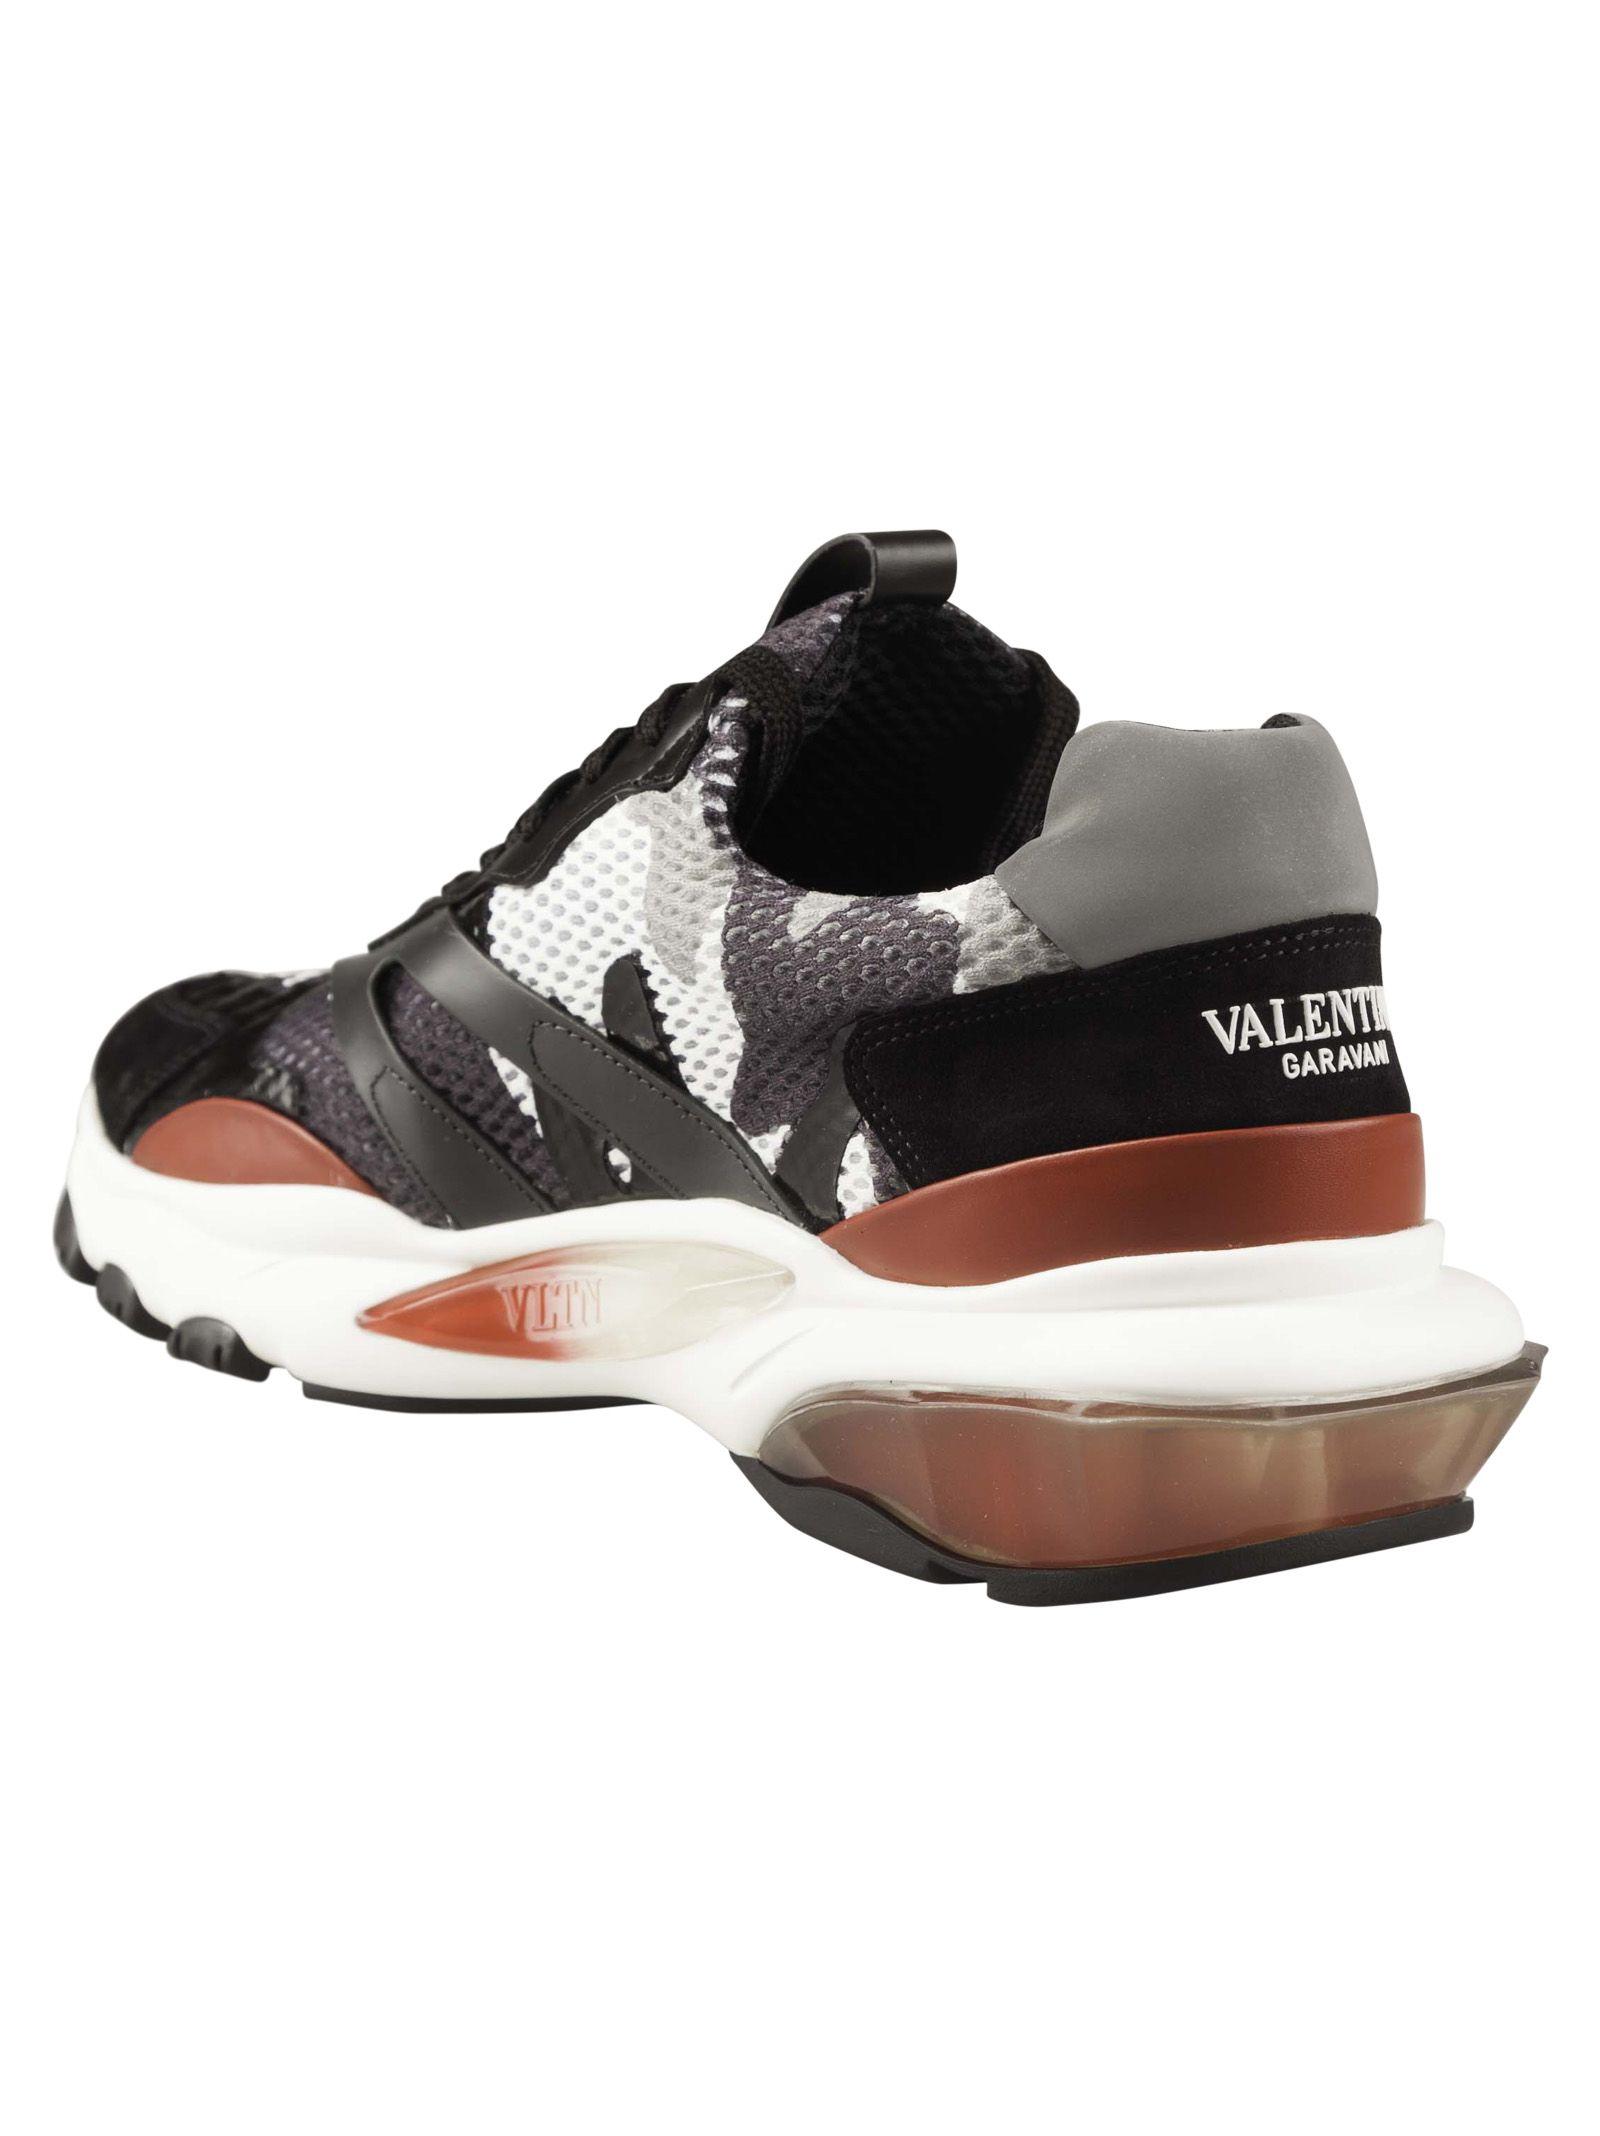 41564f57f3465 ... Valentino Garavani Camouflage Bounce Sneakers - Light Grey deep Grey